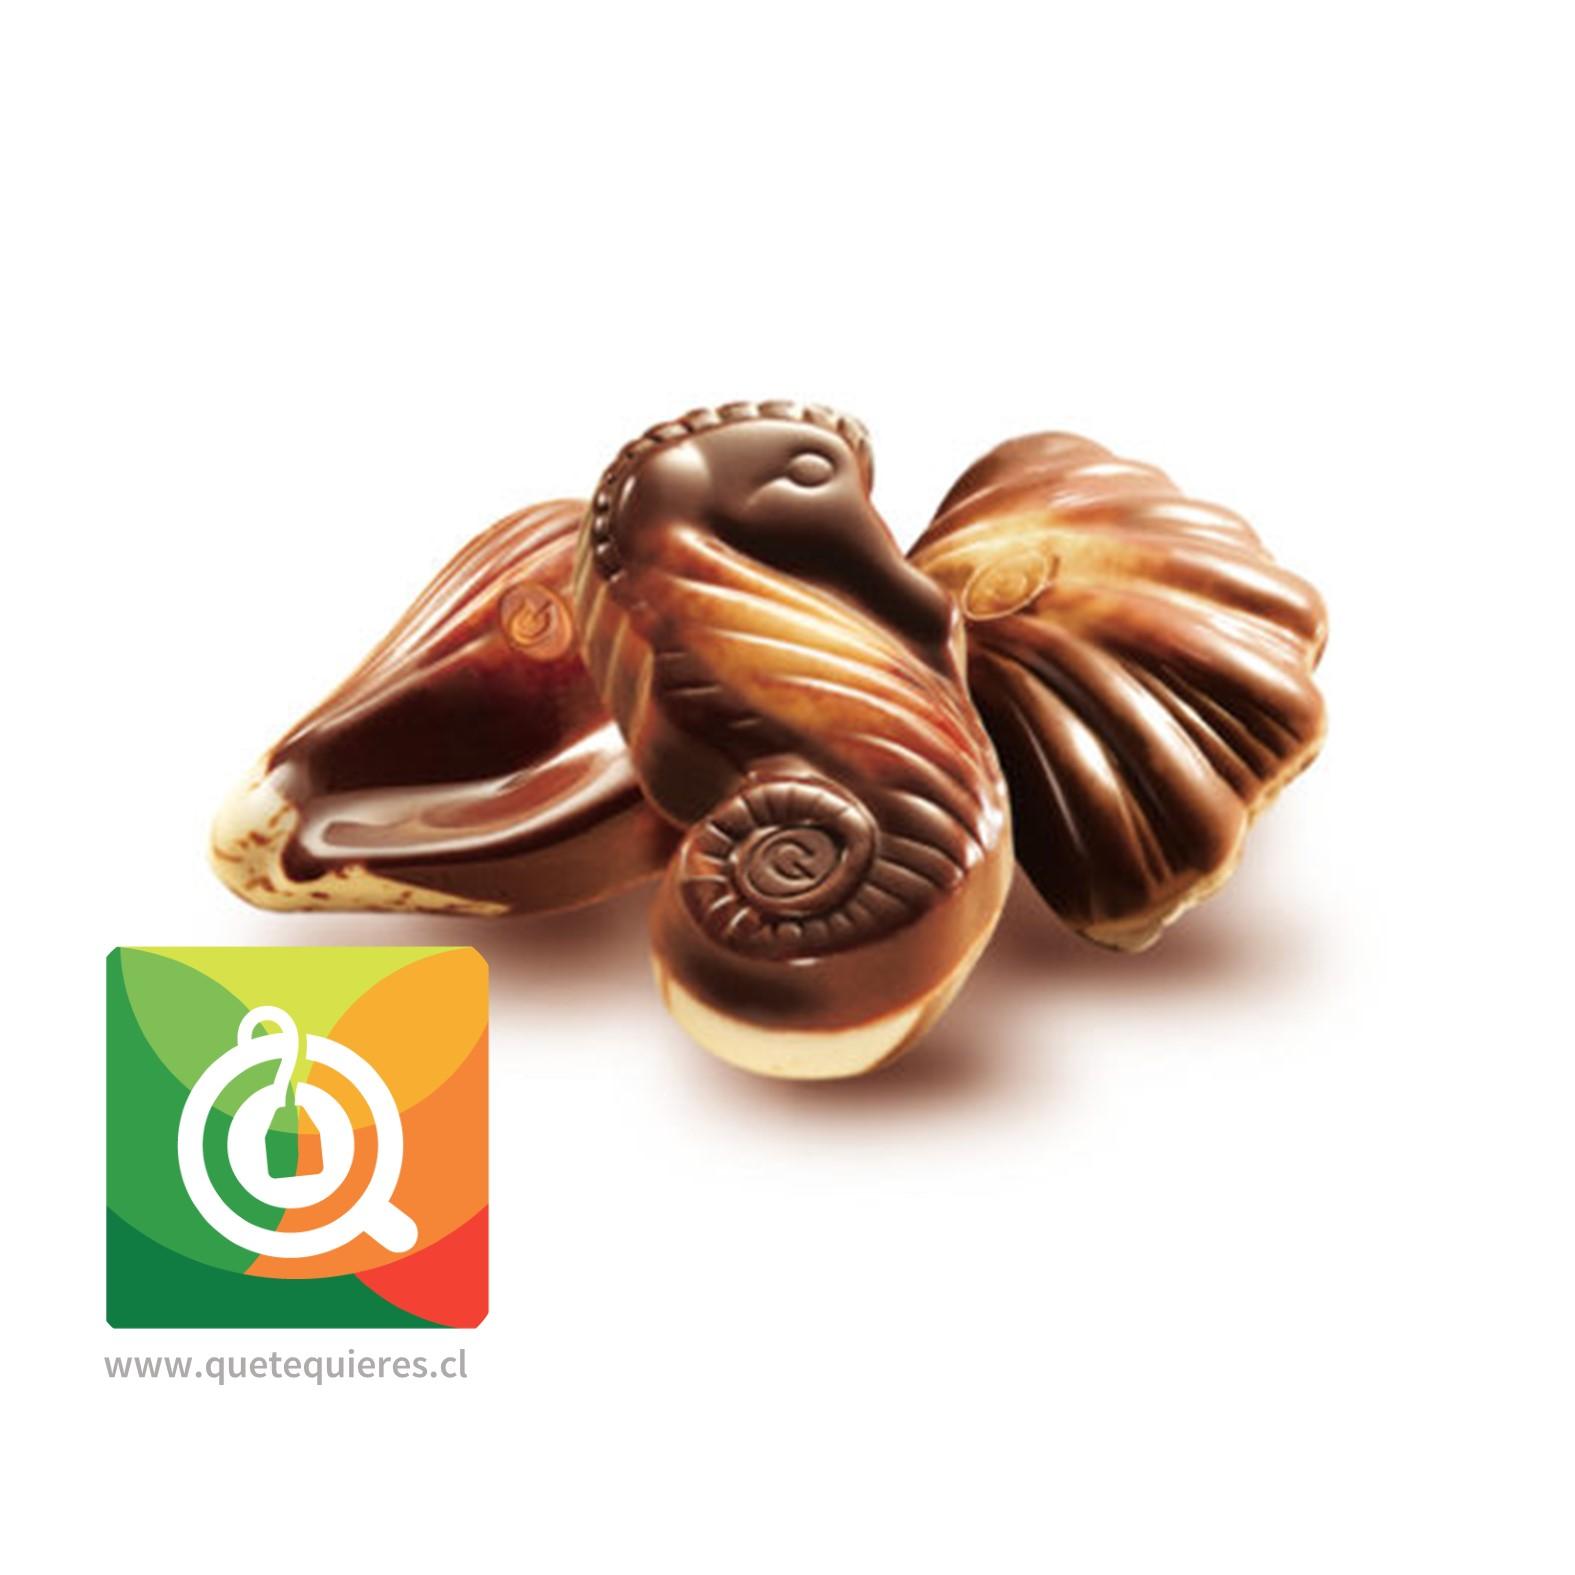 Guylian Bombones de Chocolate - The Original Sea Shell- Image 2